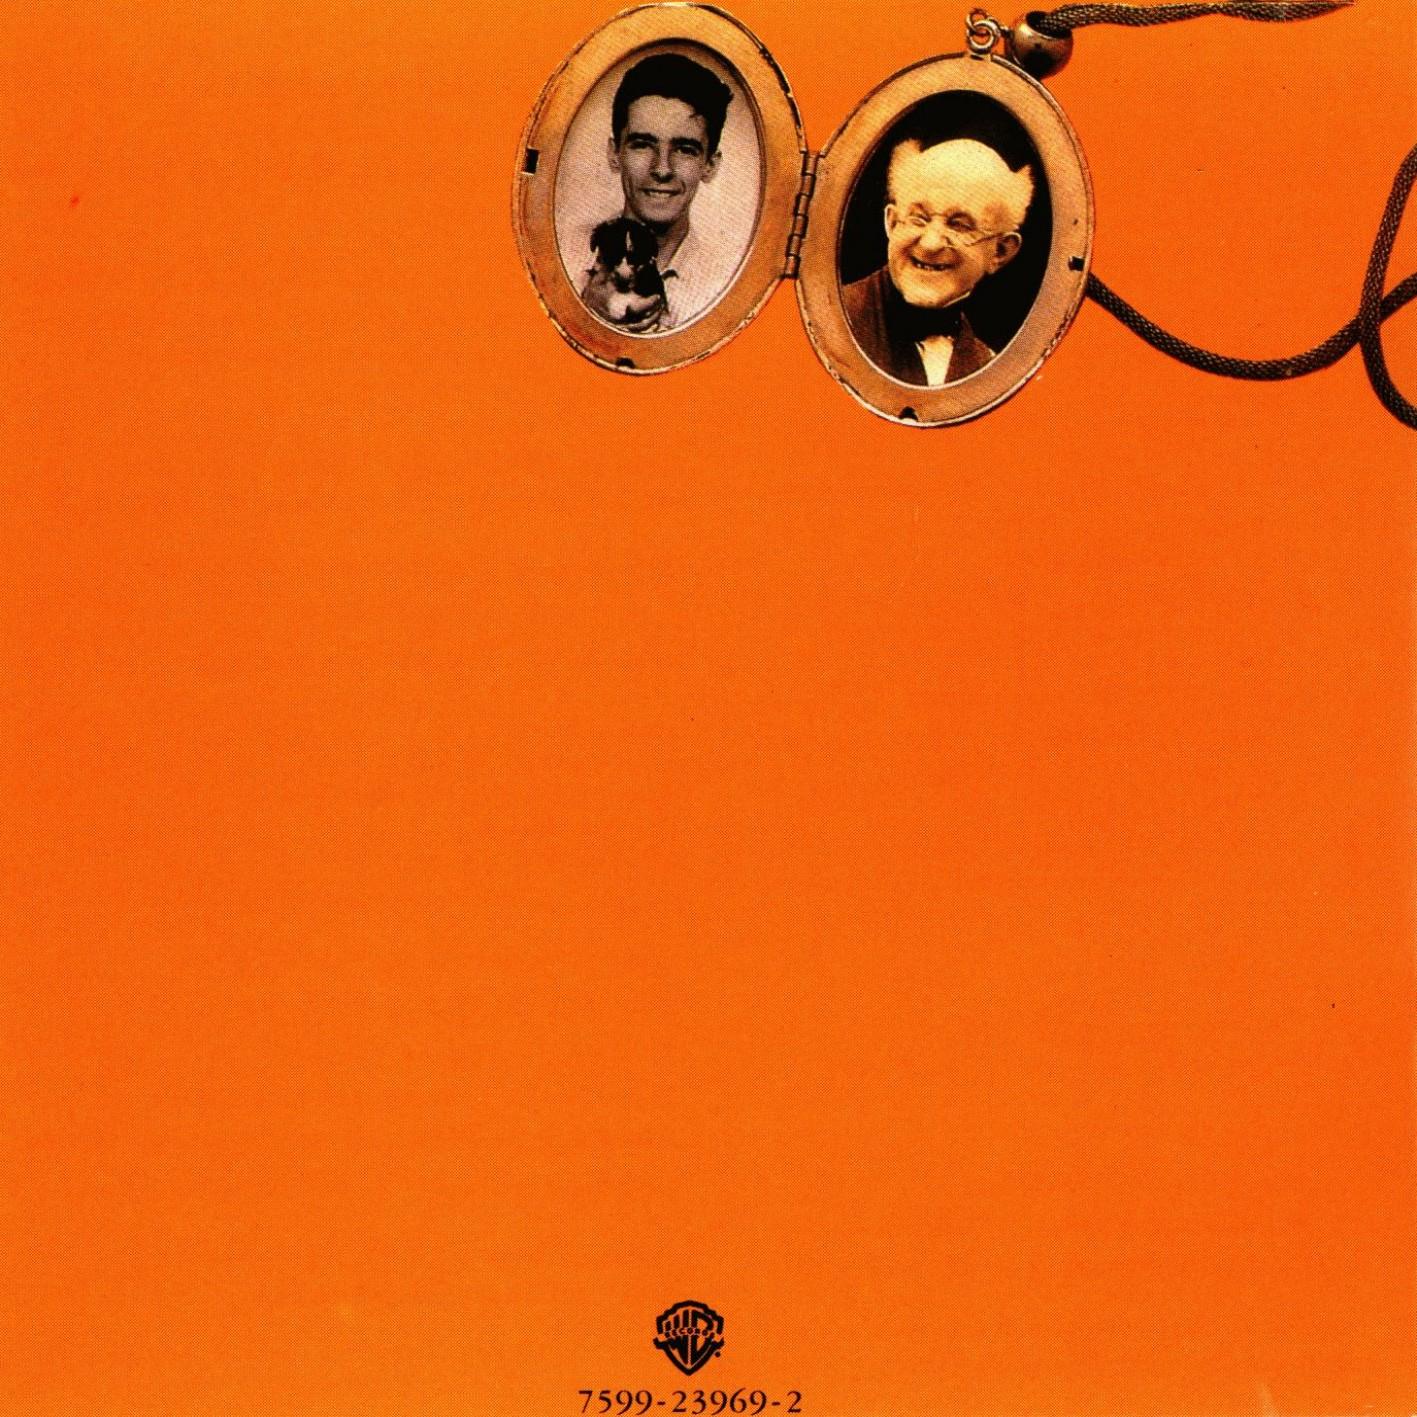 Copertina cd Alice Cooper - Dada - Inside, cover cd Alice ... Ashlee Simpson Pieces